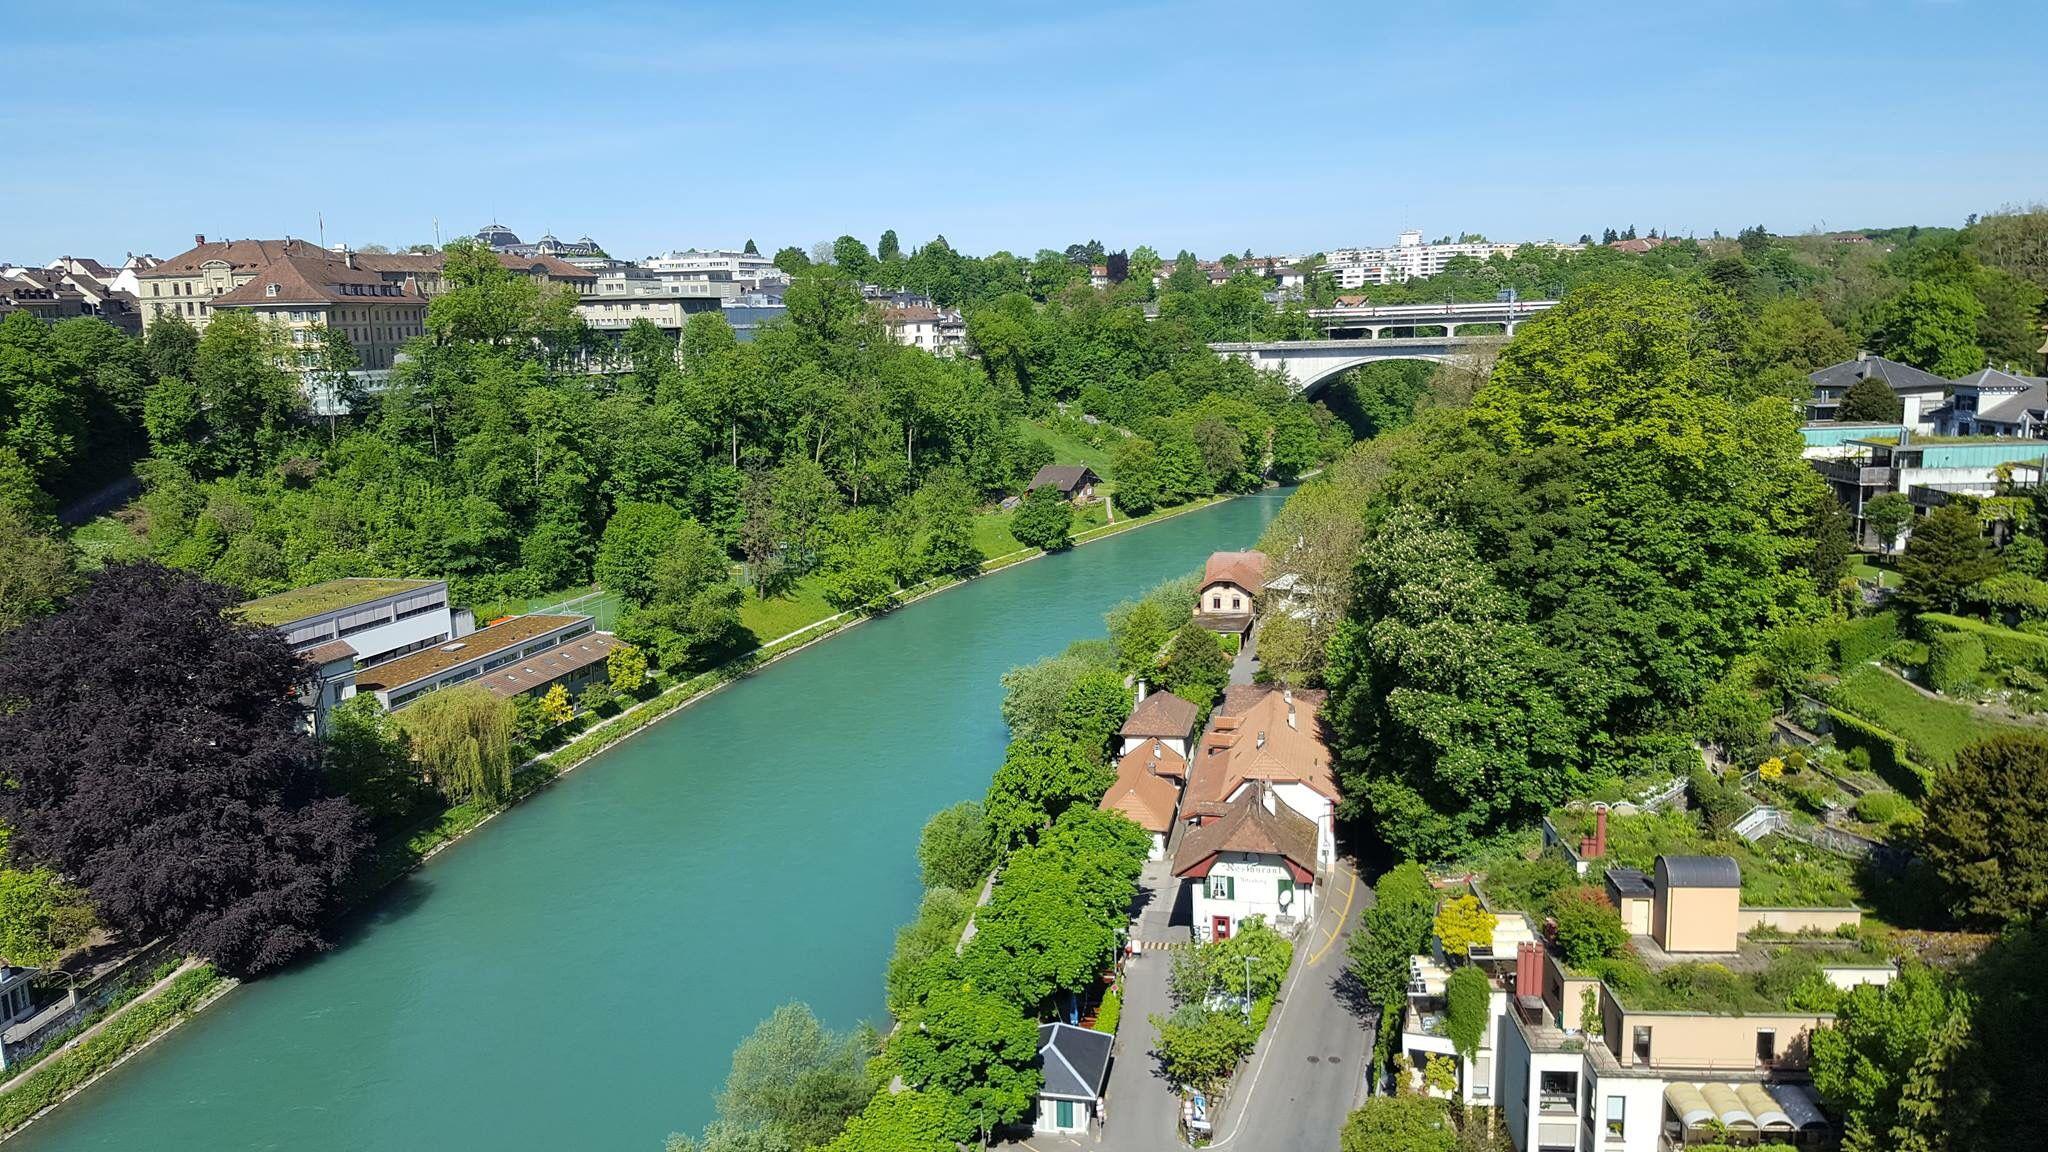 Bern, Switzerland, Spring 2016